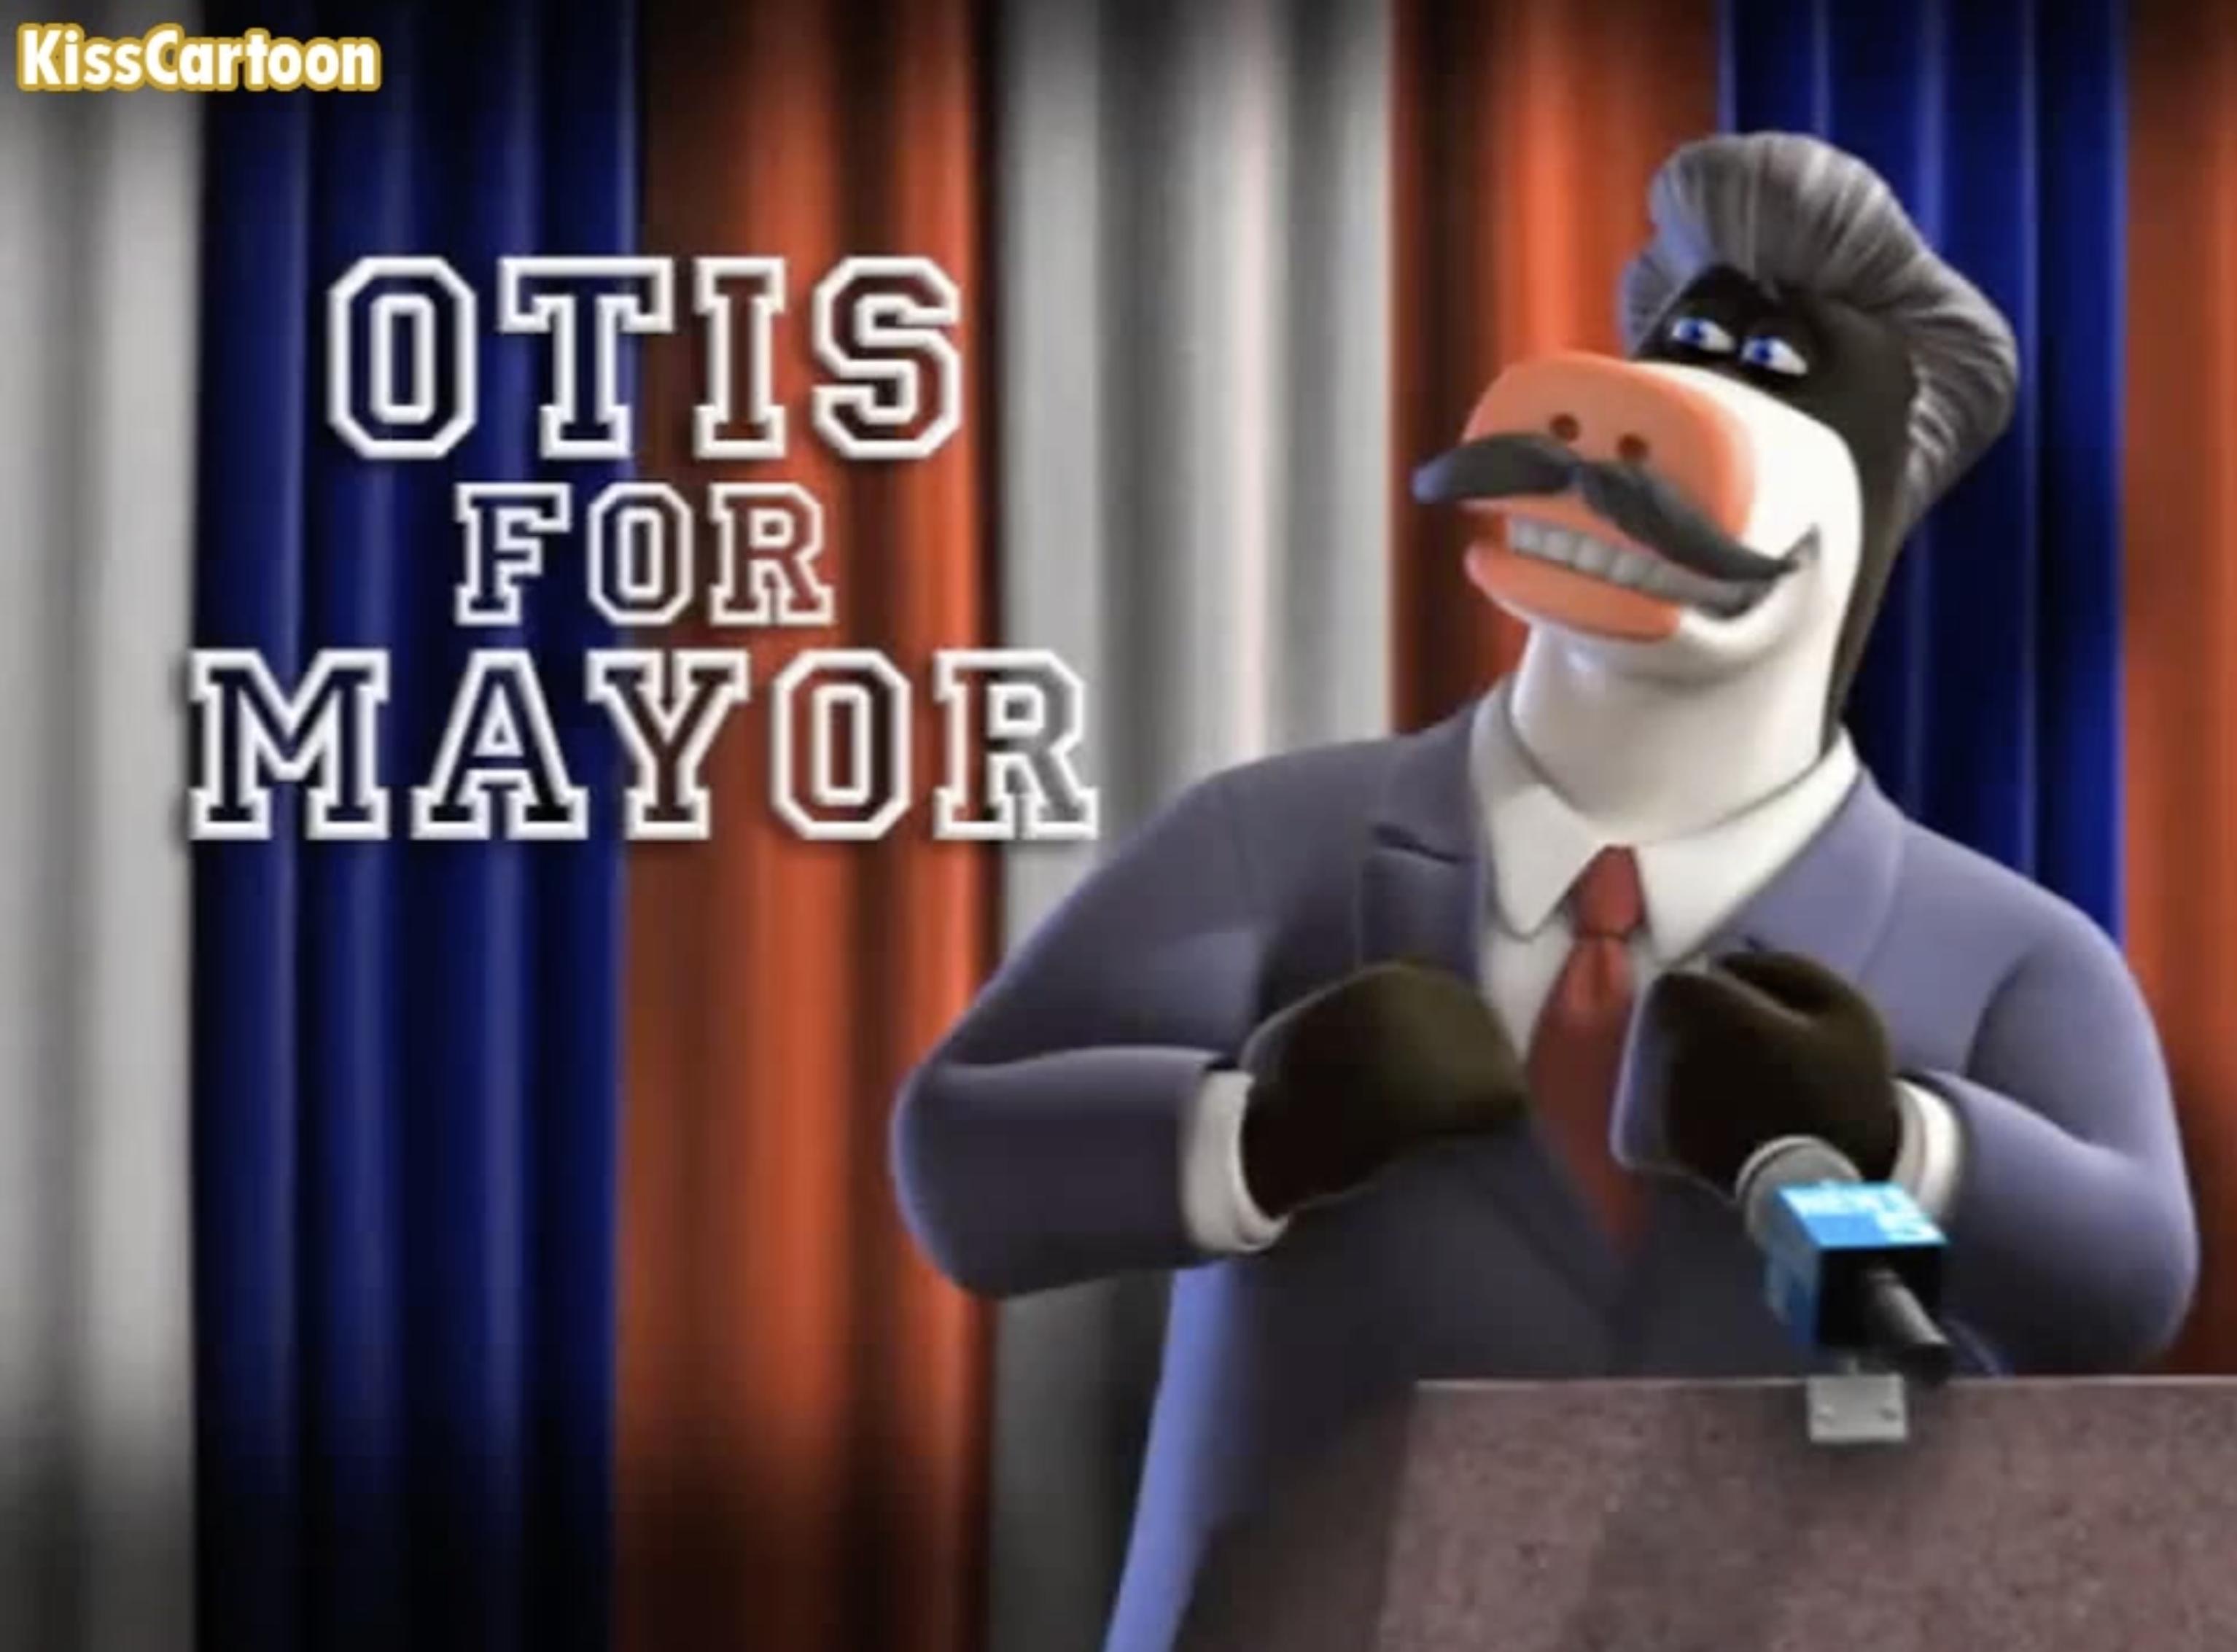 File:Otis for Mayor.png